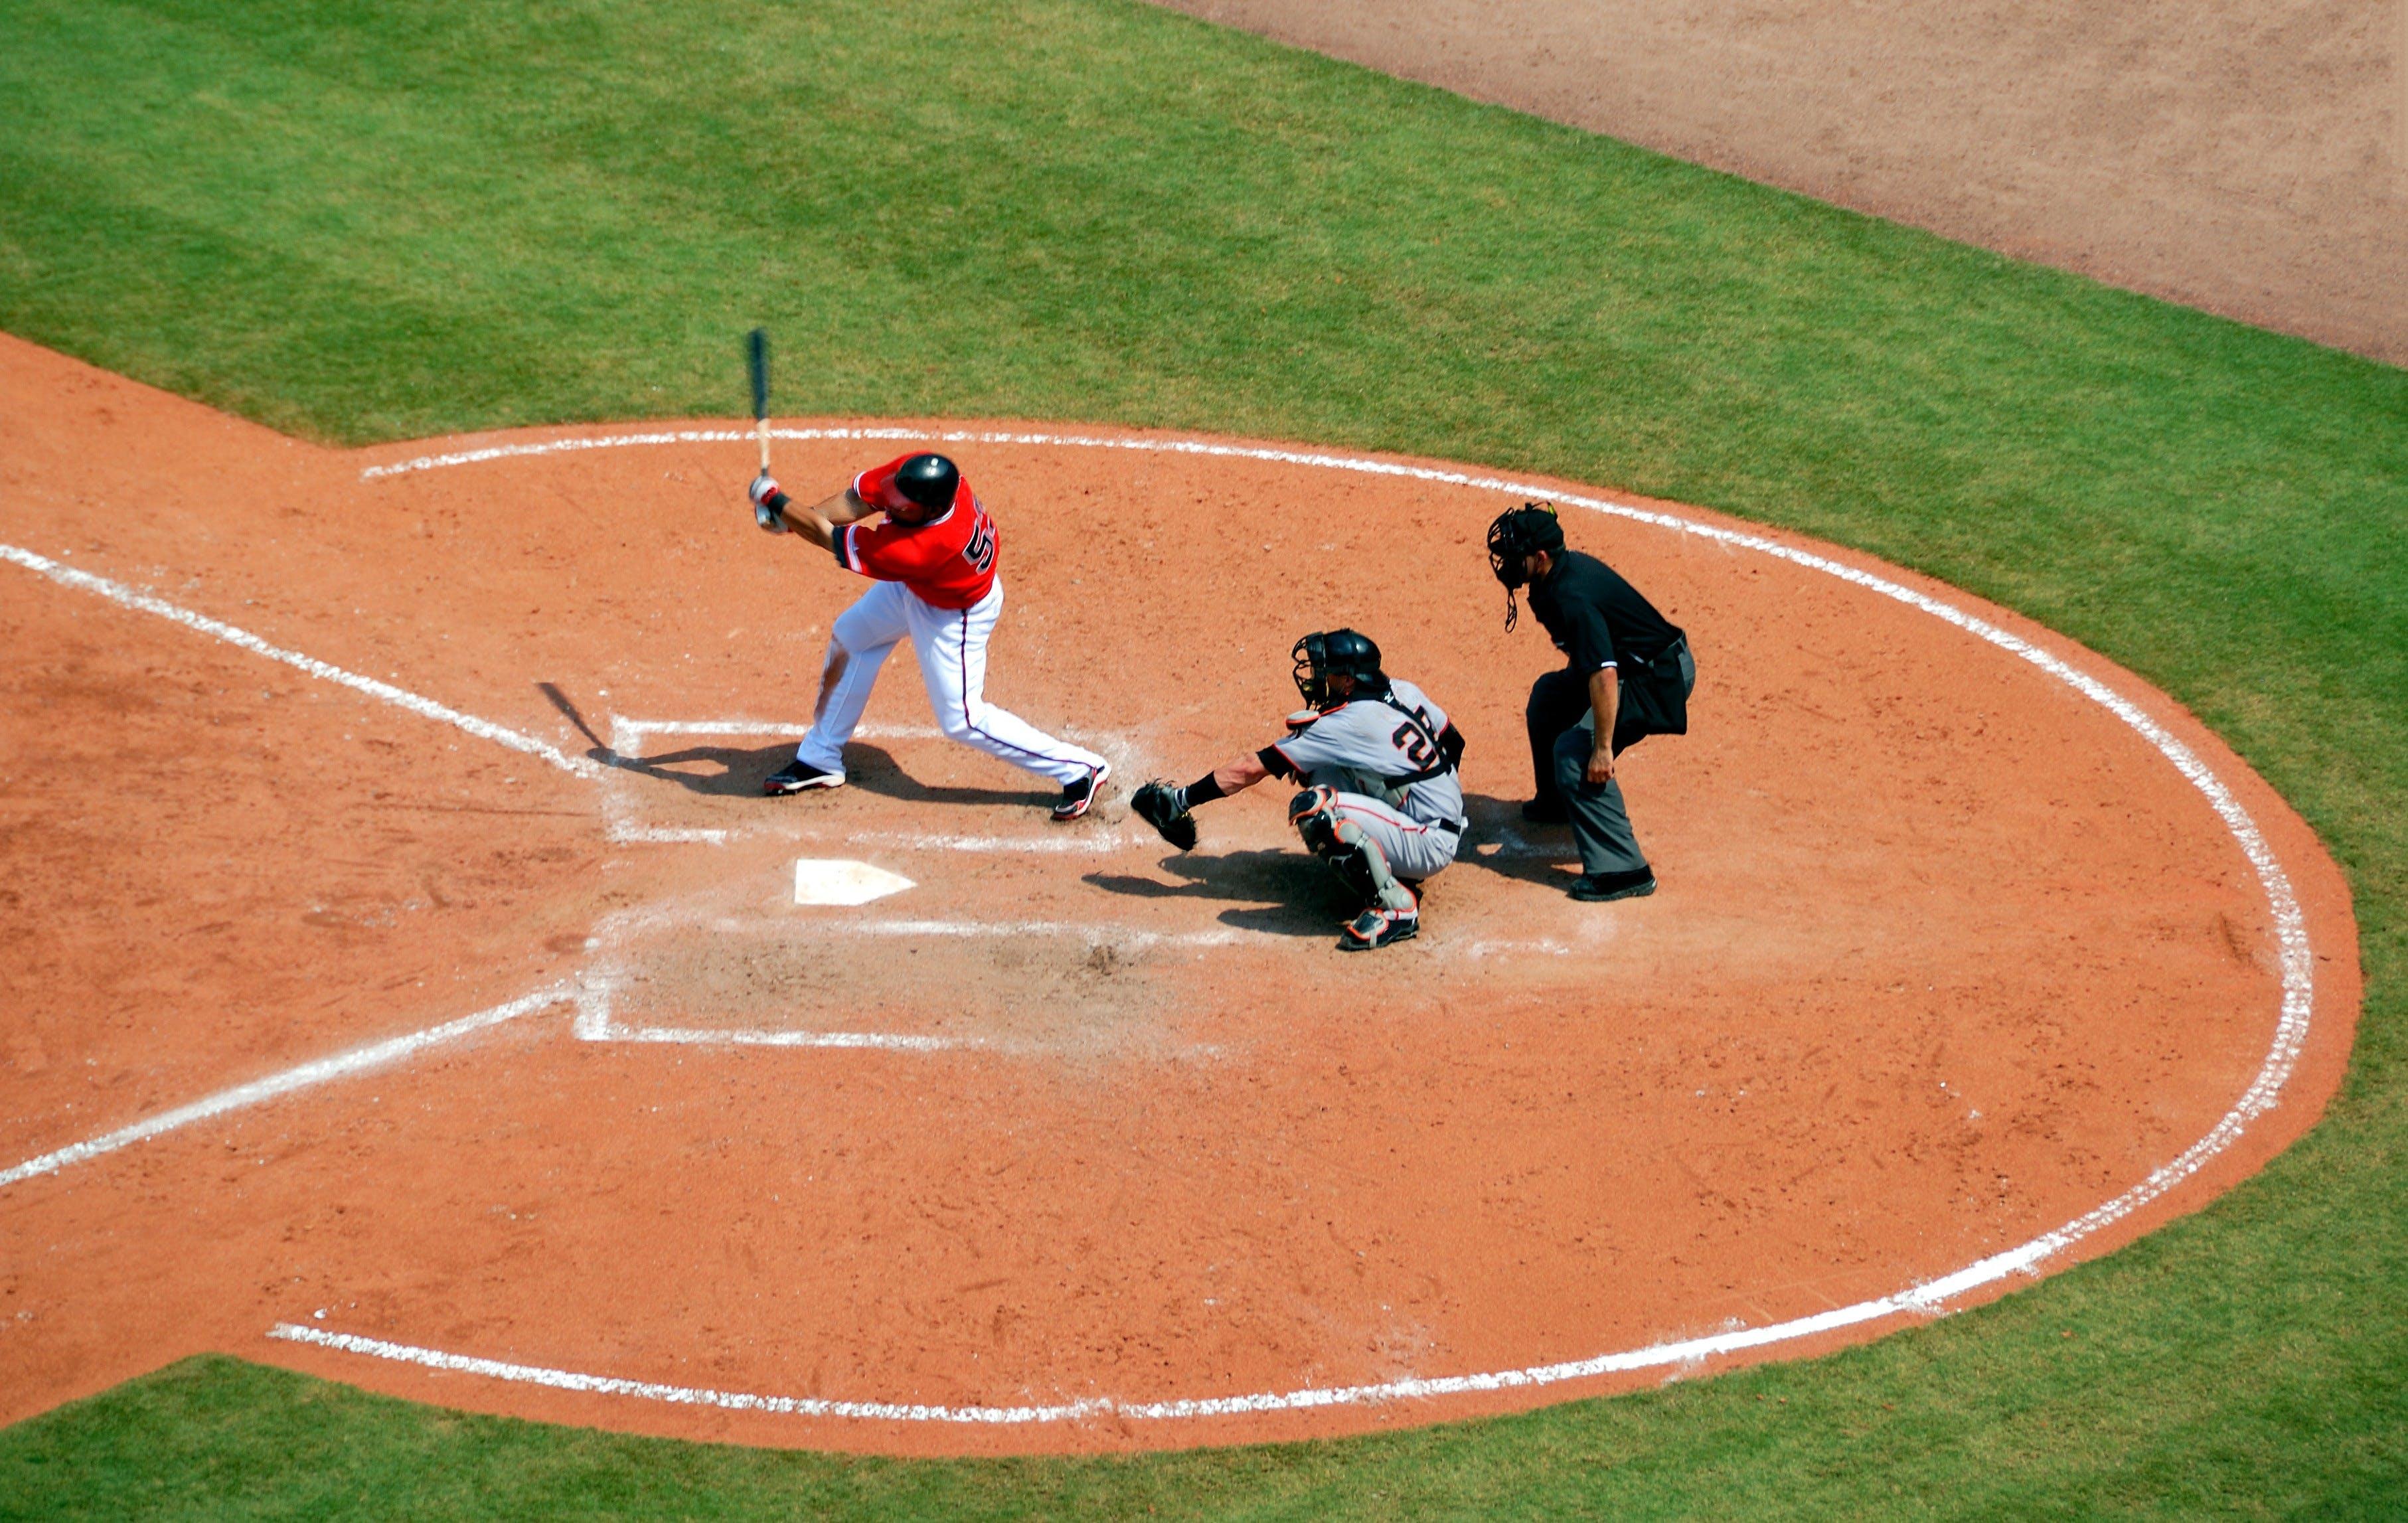 Baseball Player Standing on Baseball Stadium With Two Men